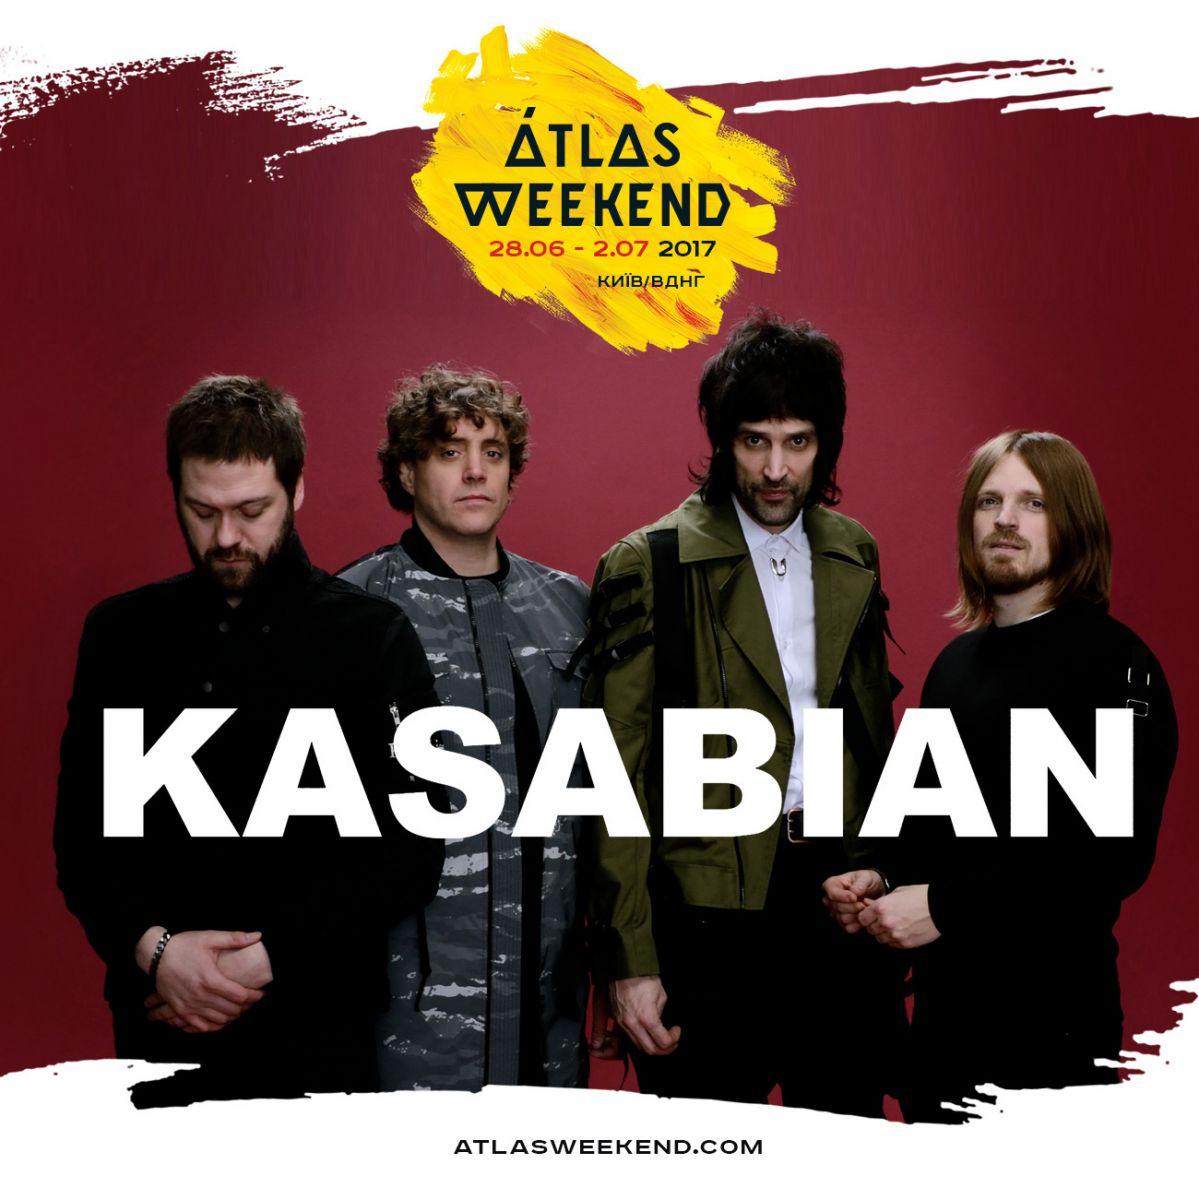 Kasabian едут на фестиваль Atlas Weekend 2017